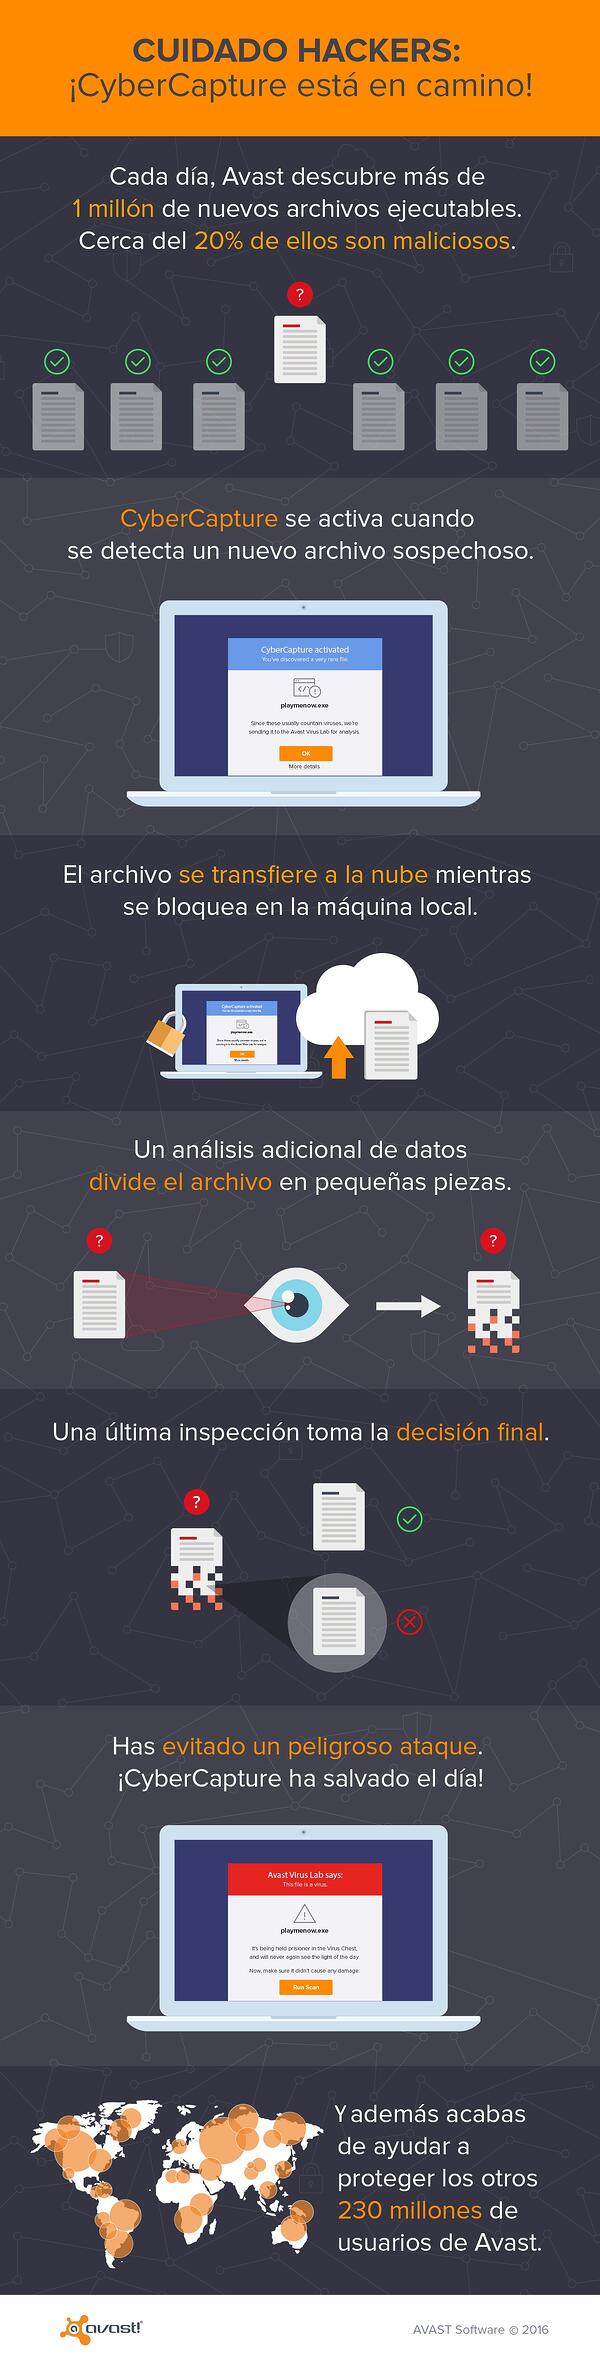 nitro_cyber_capture_infographics_ES_updated.jpg